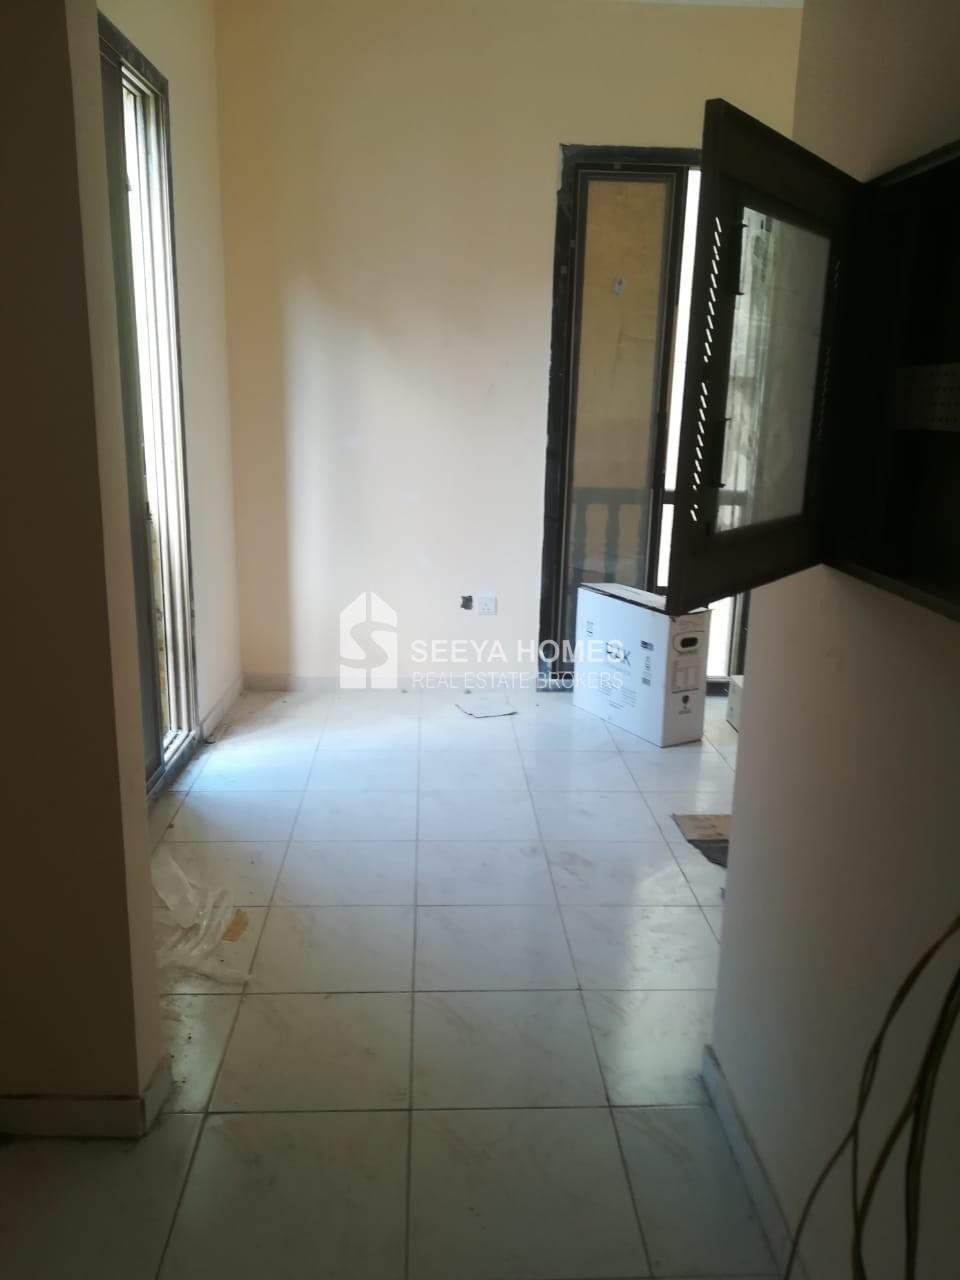 Best price for Bulk Studios in Bur Dubai with Open kitchen